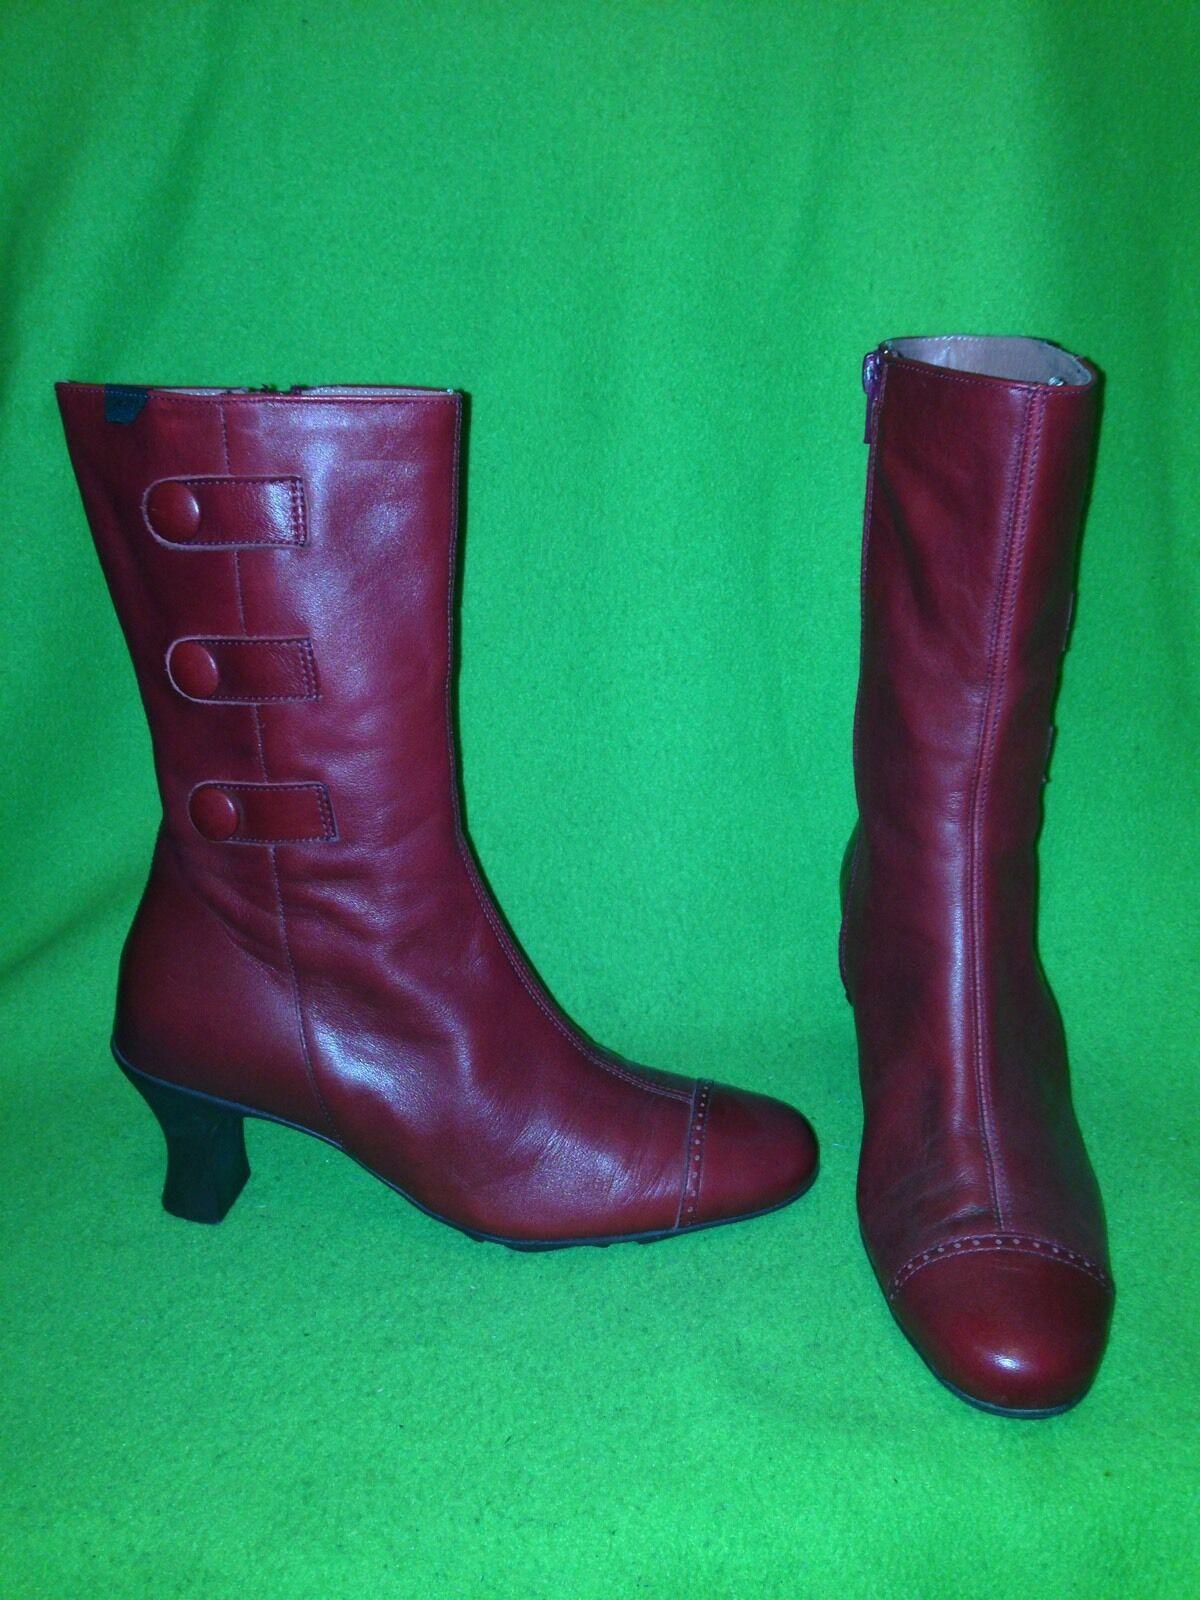 Red Camper Mid-Calf Boots 5.5 35